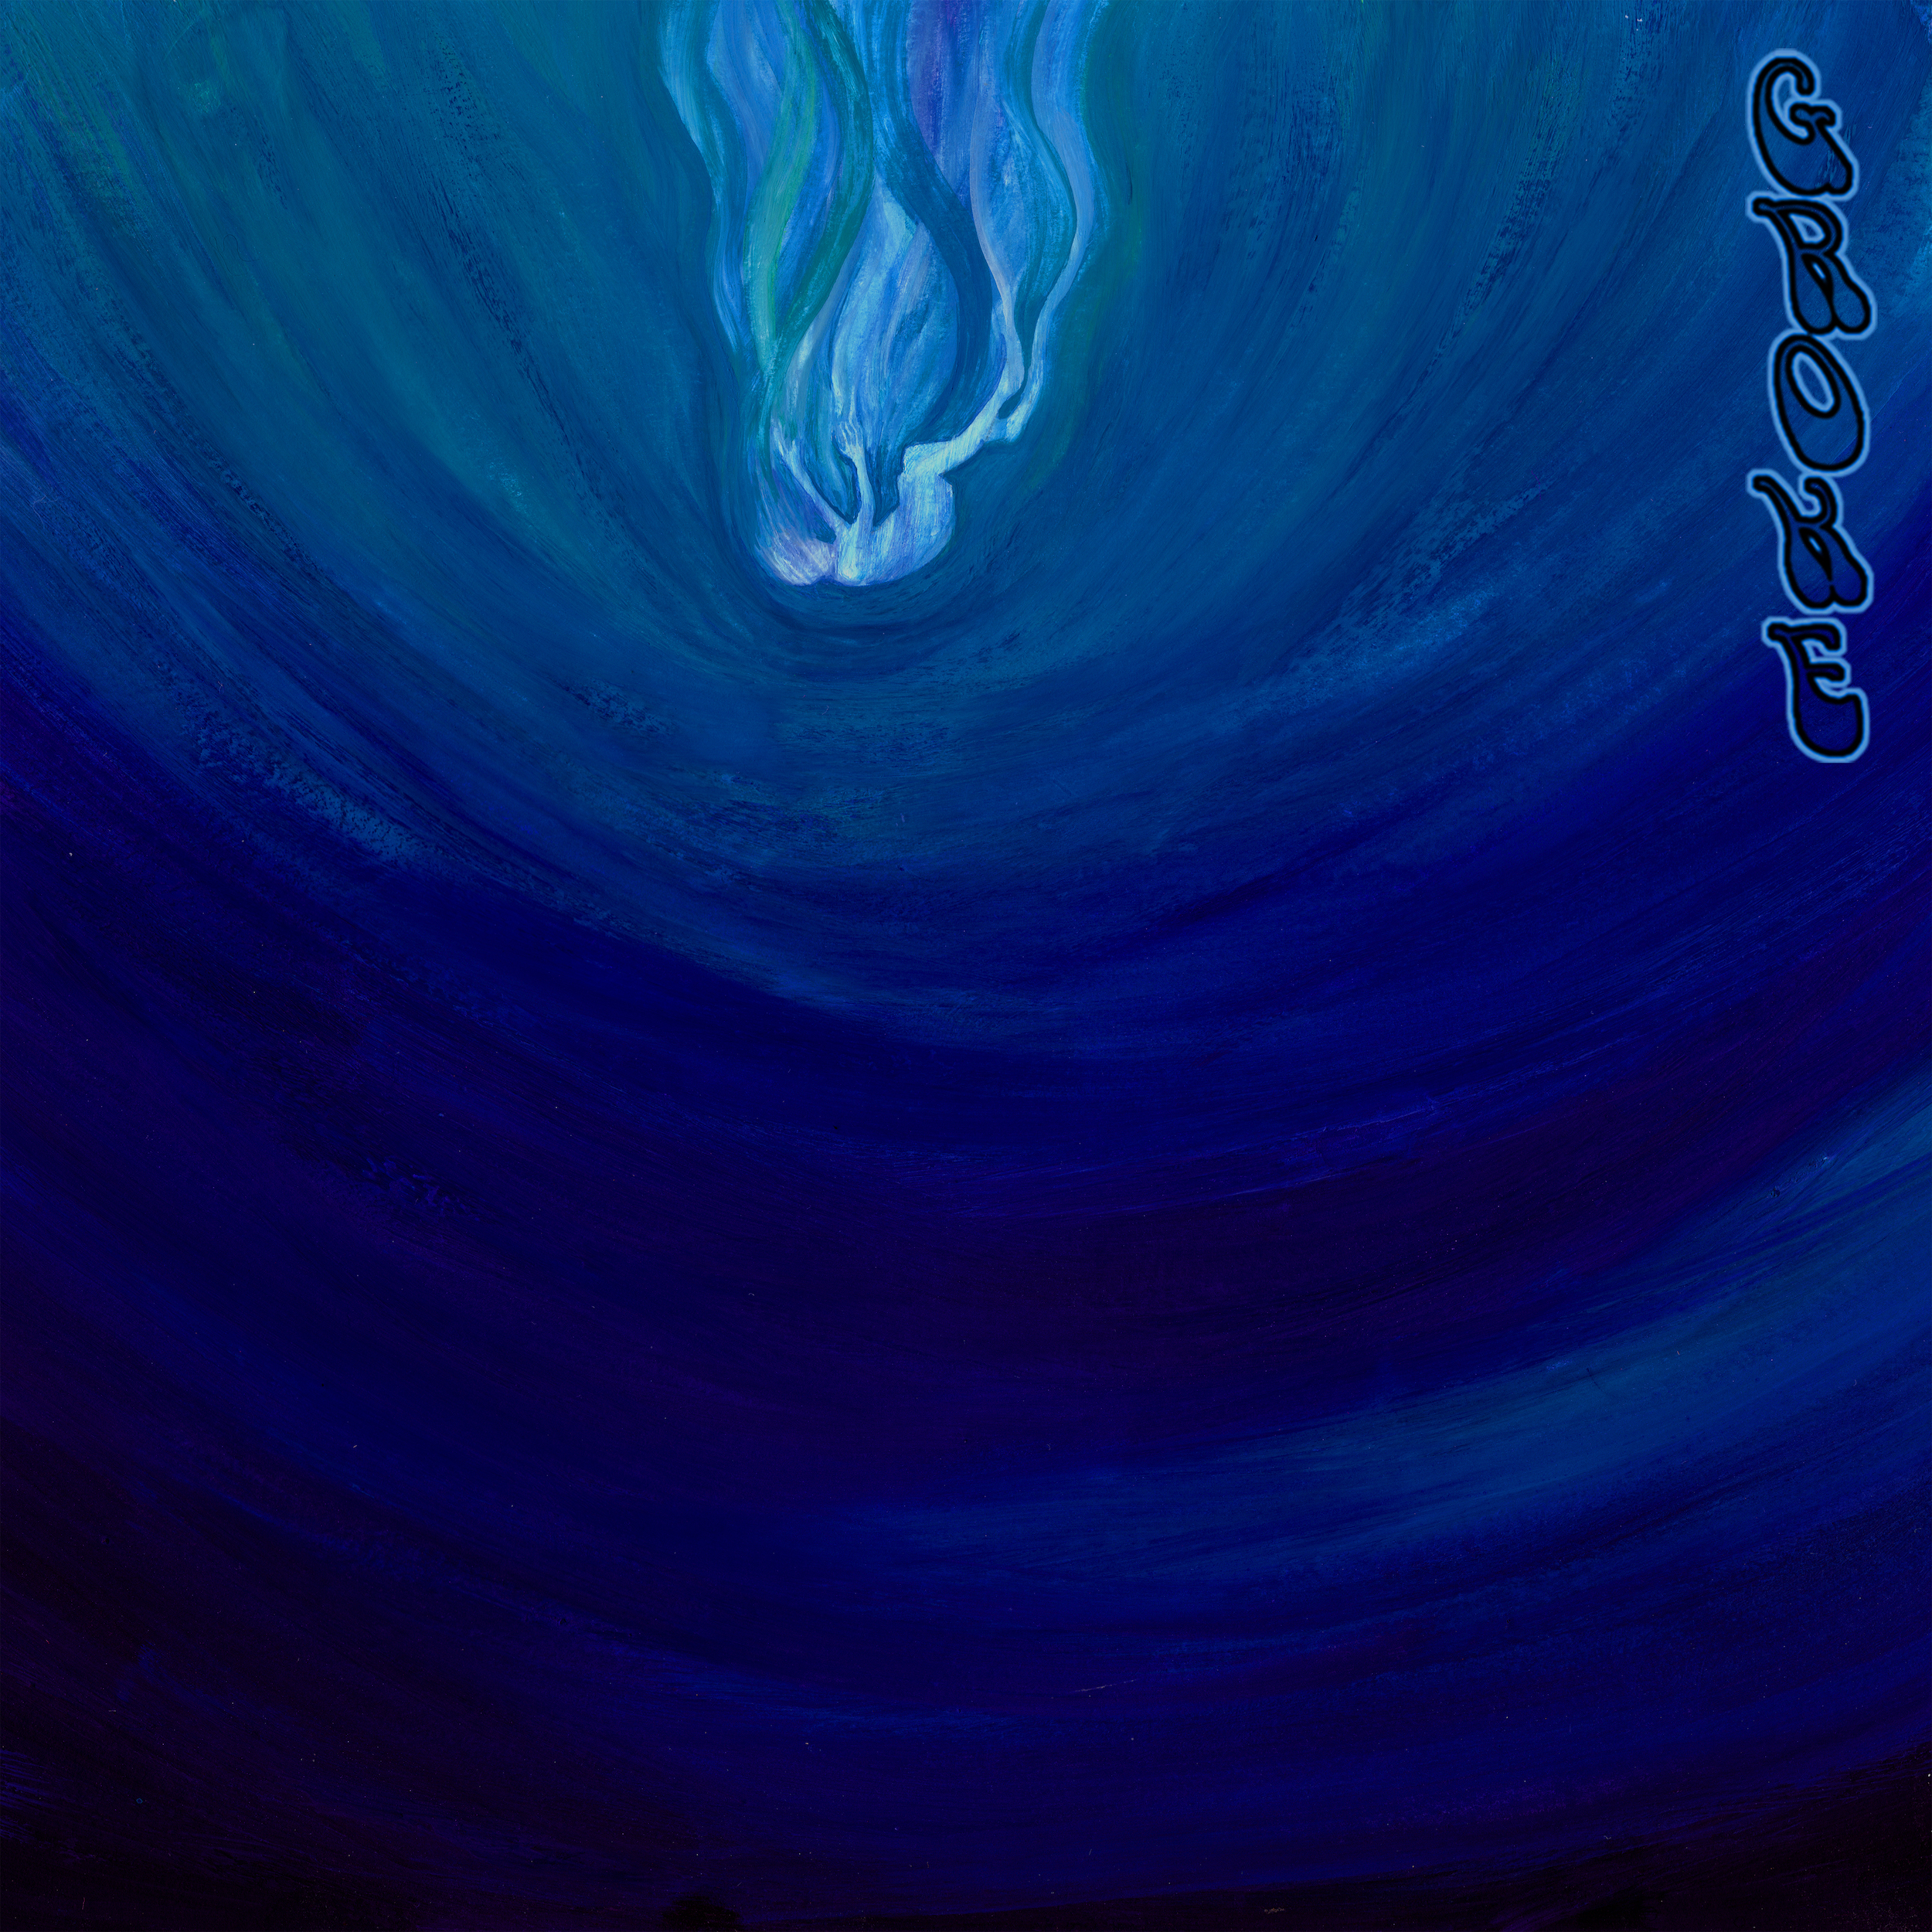 Groke - Drowning